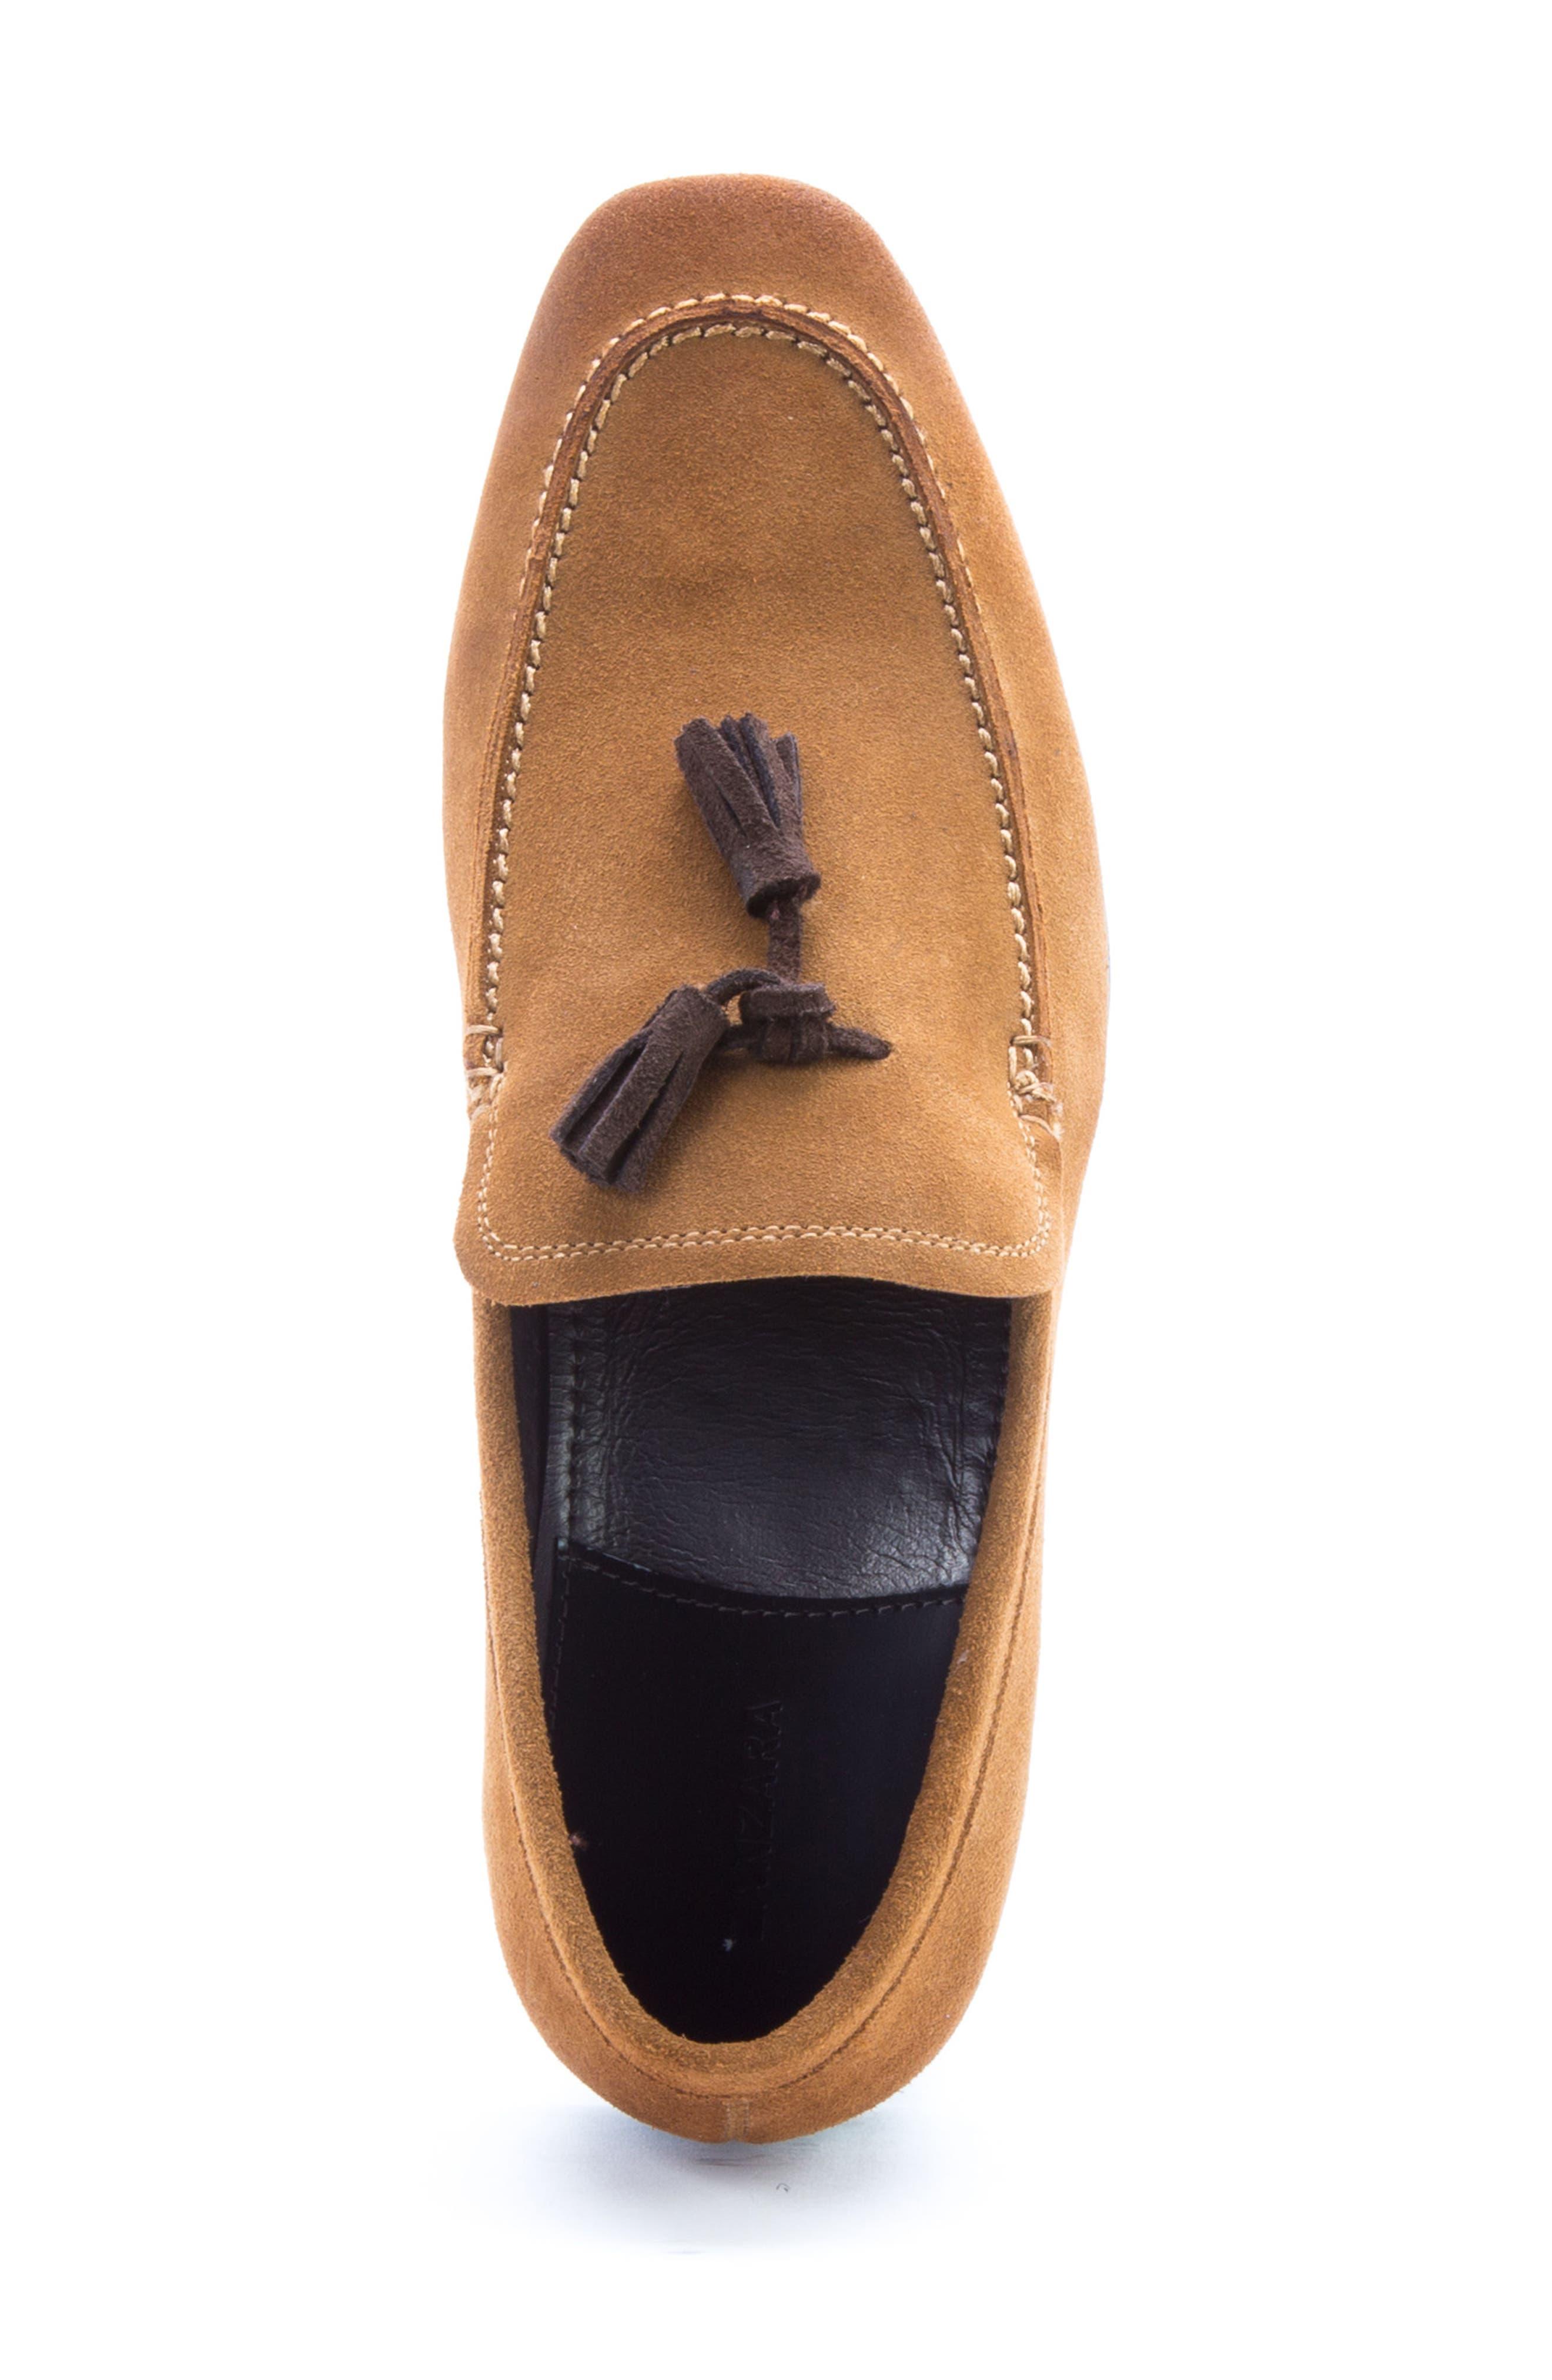 Severn Tassel Venetian Loafer,                             Alternate thumbnail 5, color,                             COGNAC SUEDE